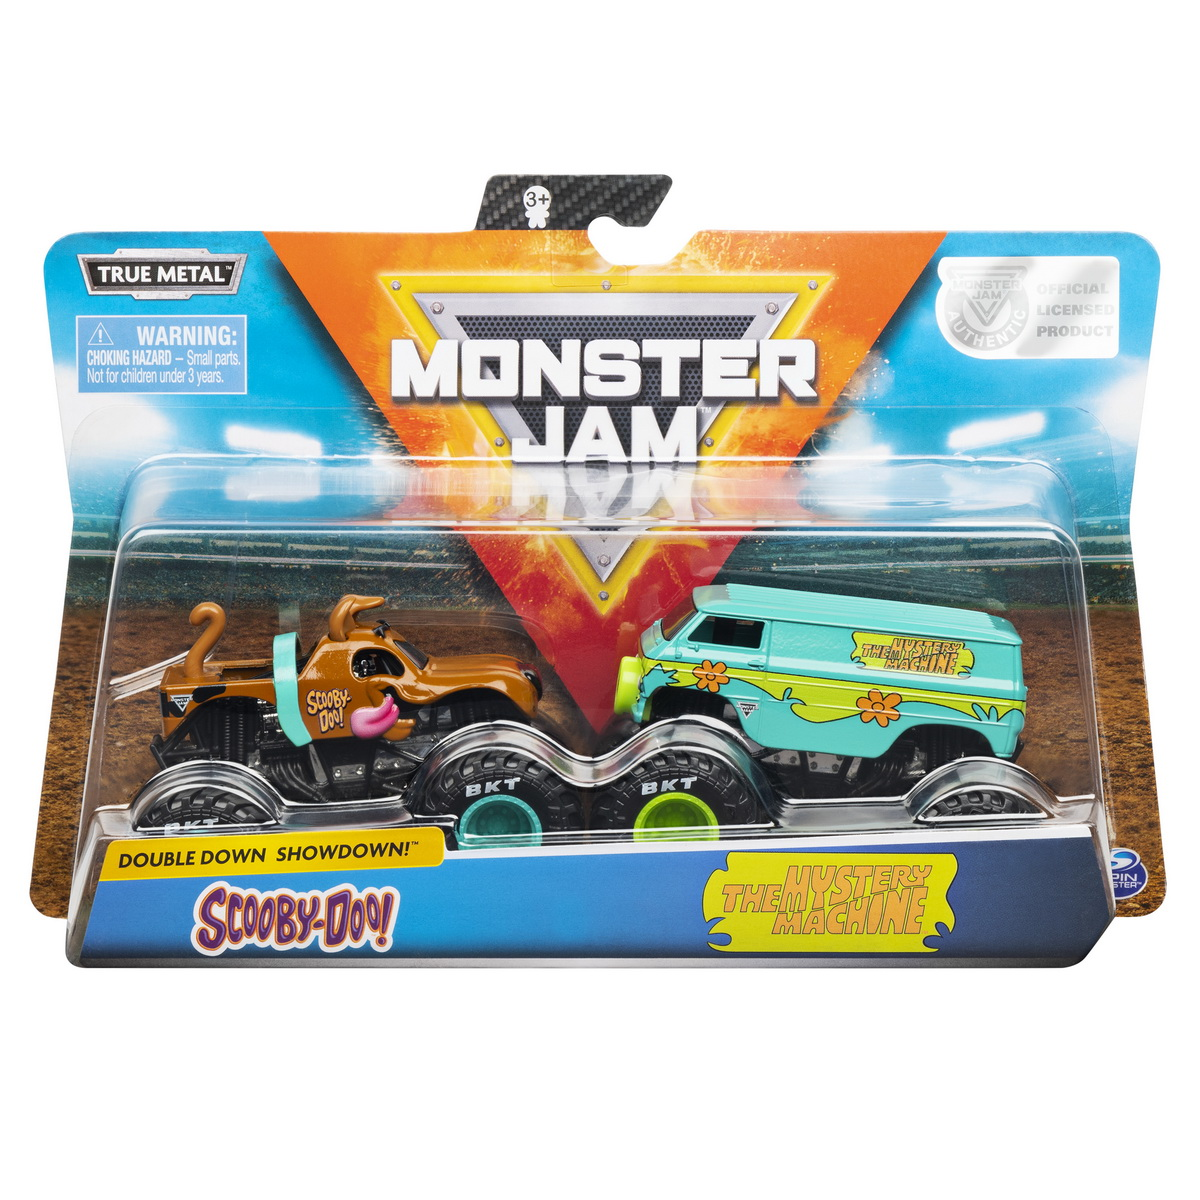 Monster Jam Set 2 Machete Metalice Scooby Doo Si The Mystery Machine